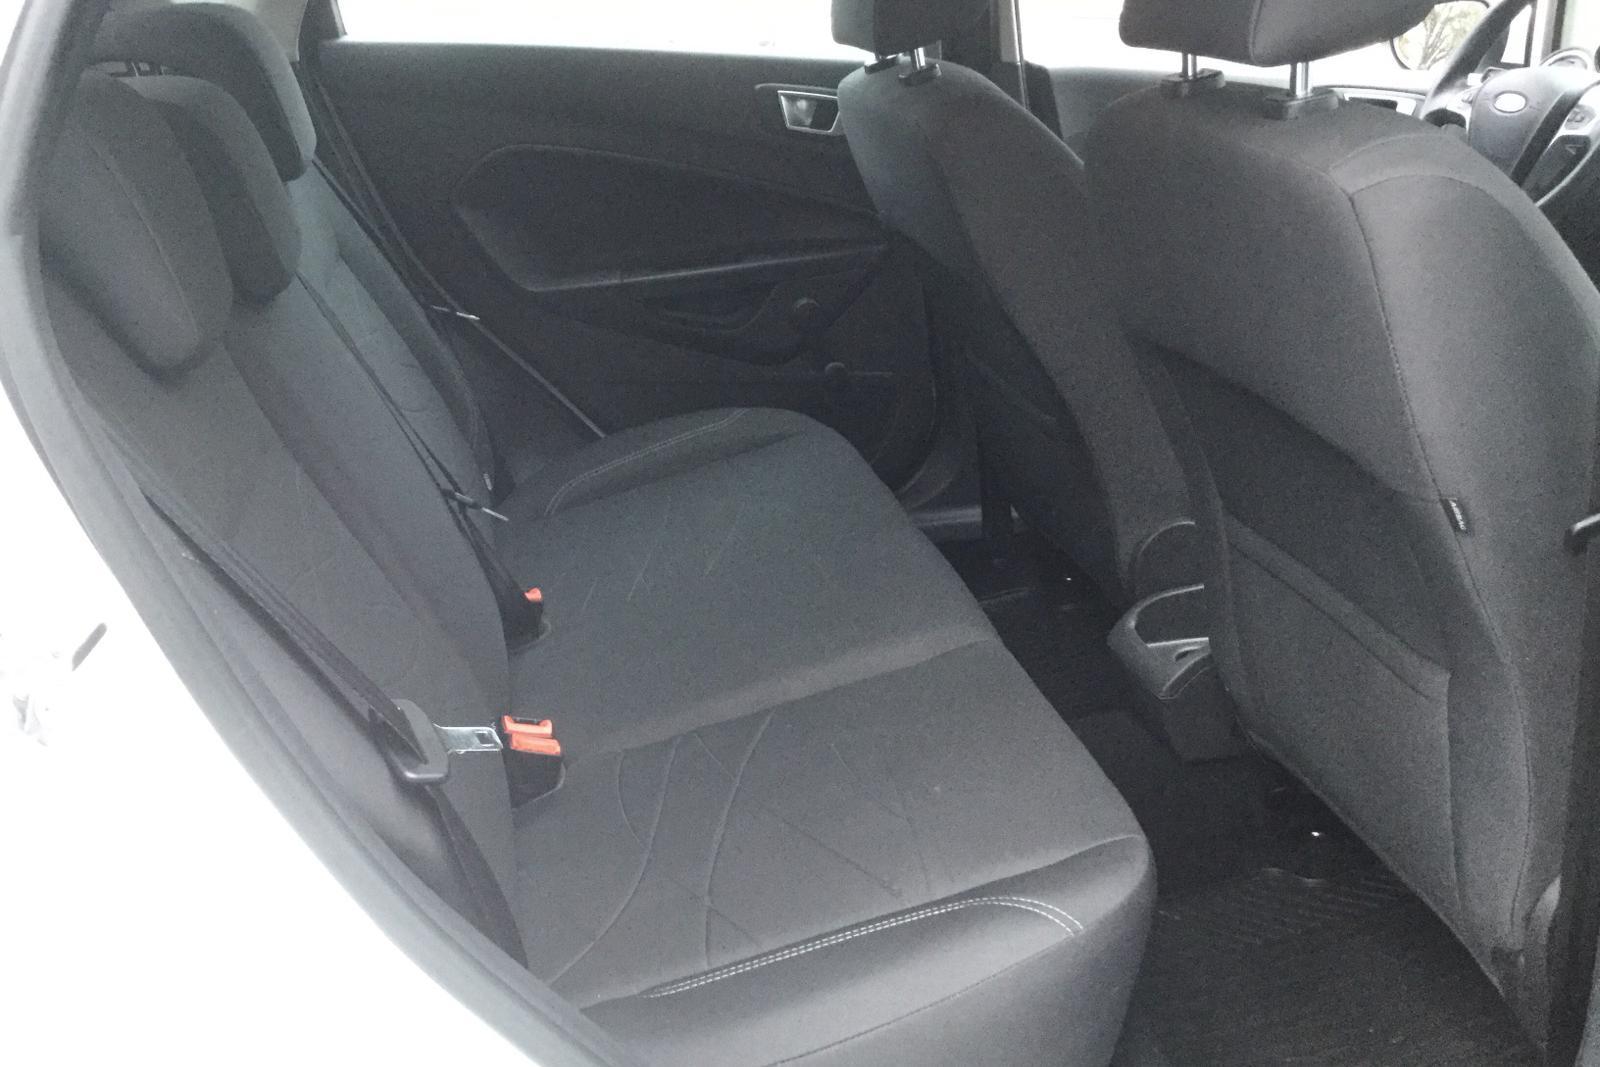 Ford Fiesta 1.5 TDCi Econetic 5dr (95hk) - 0 km - Manual - white - 2016